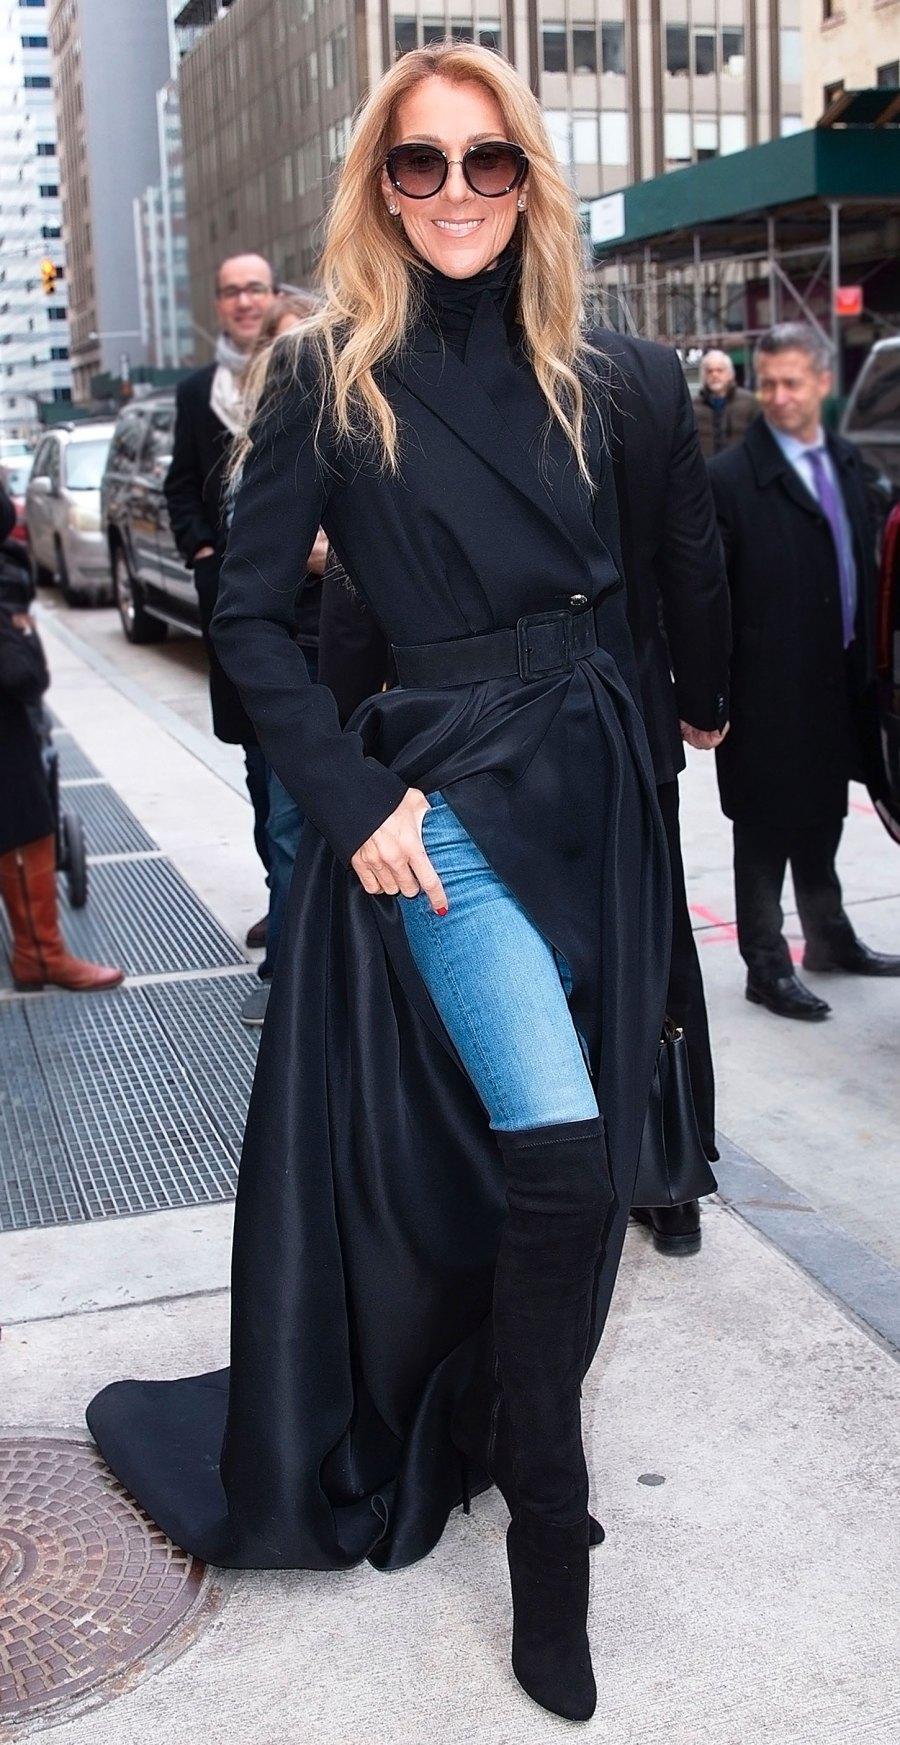 Celine Dion Black Coat February 29, 2020